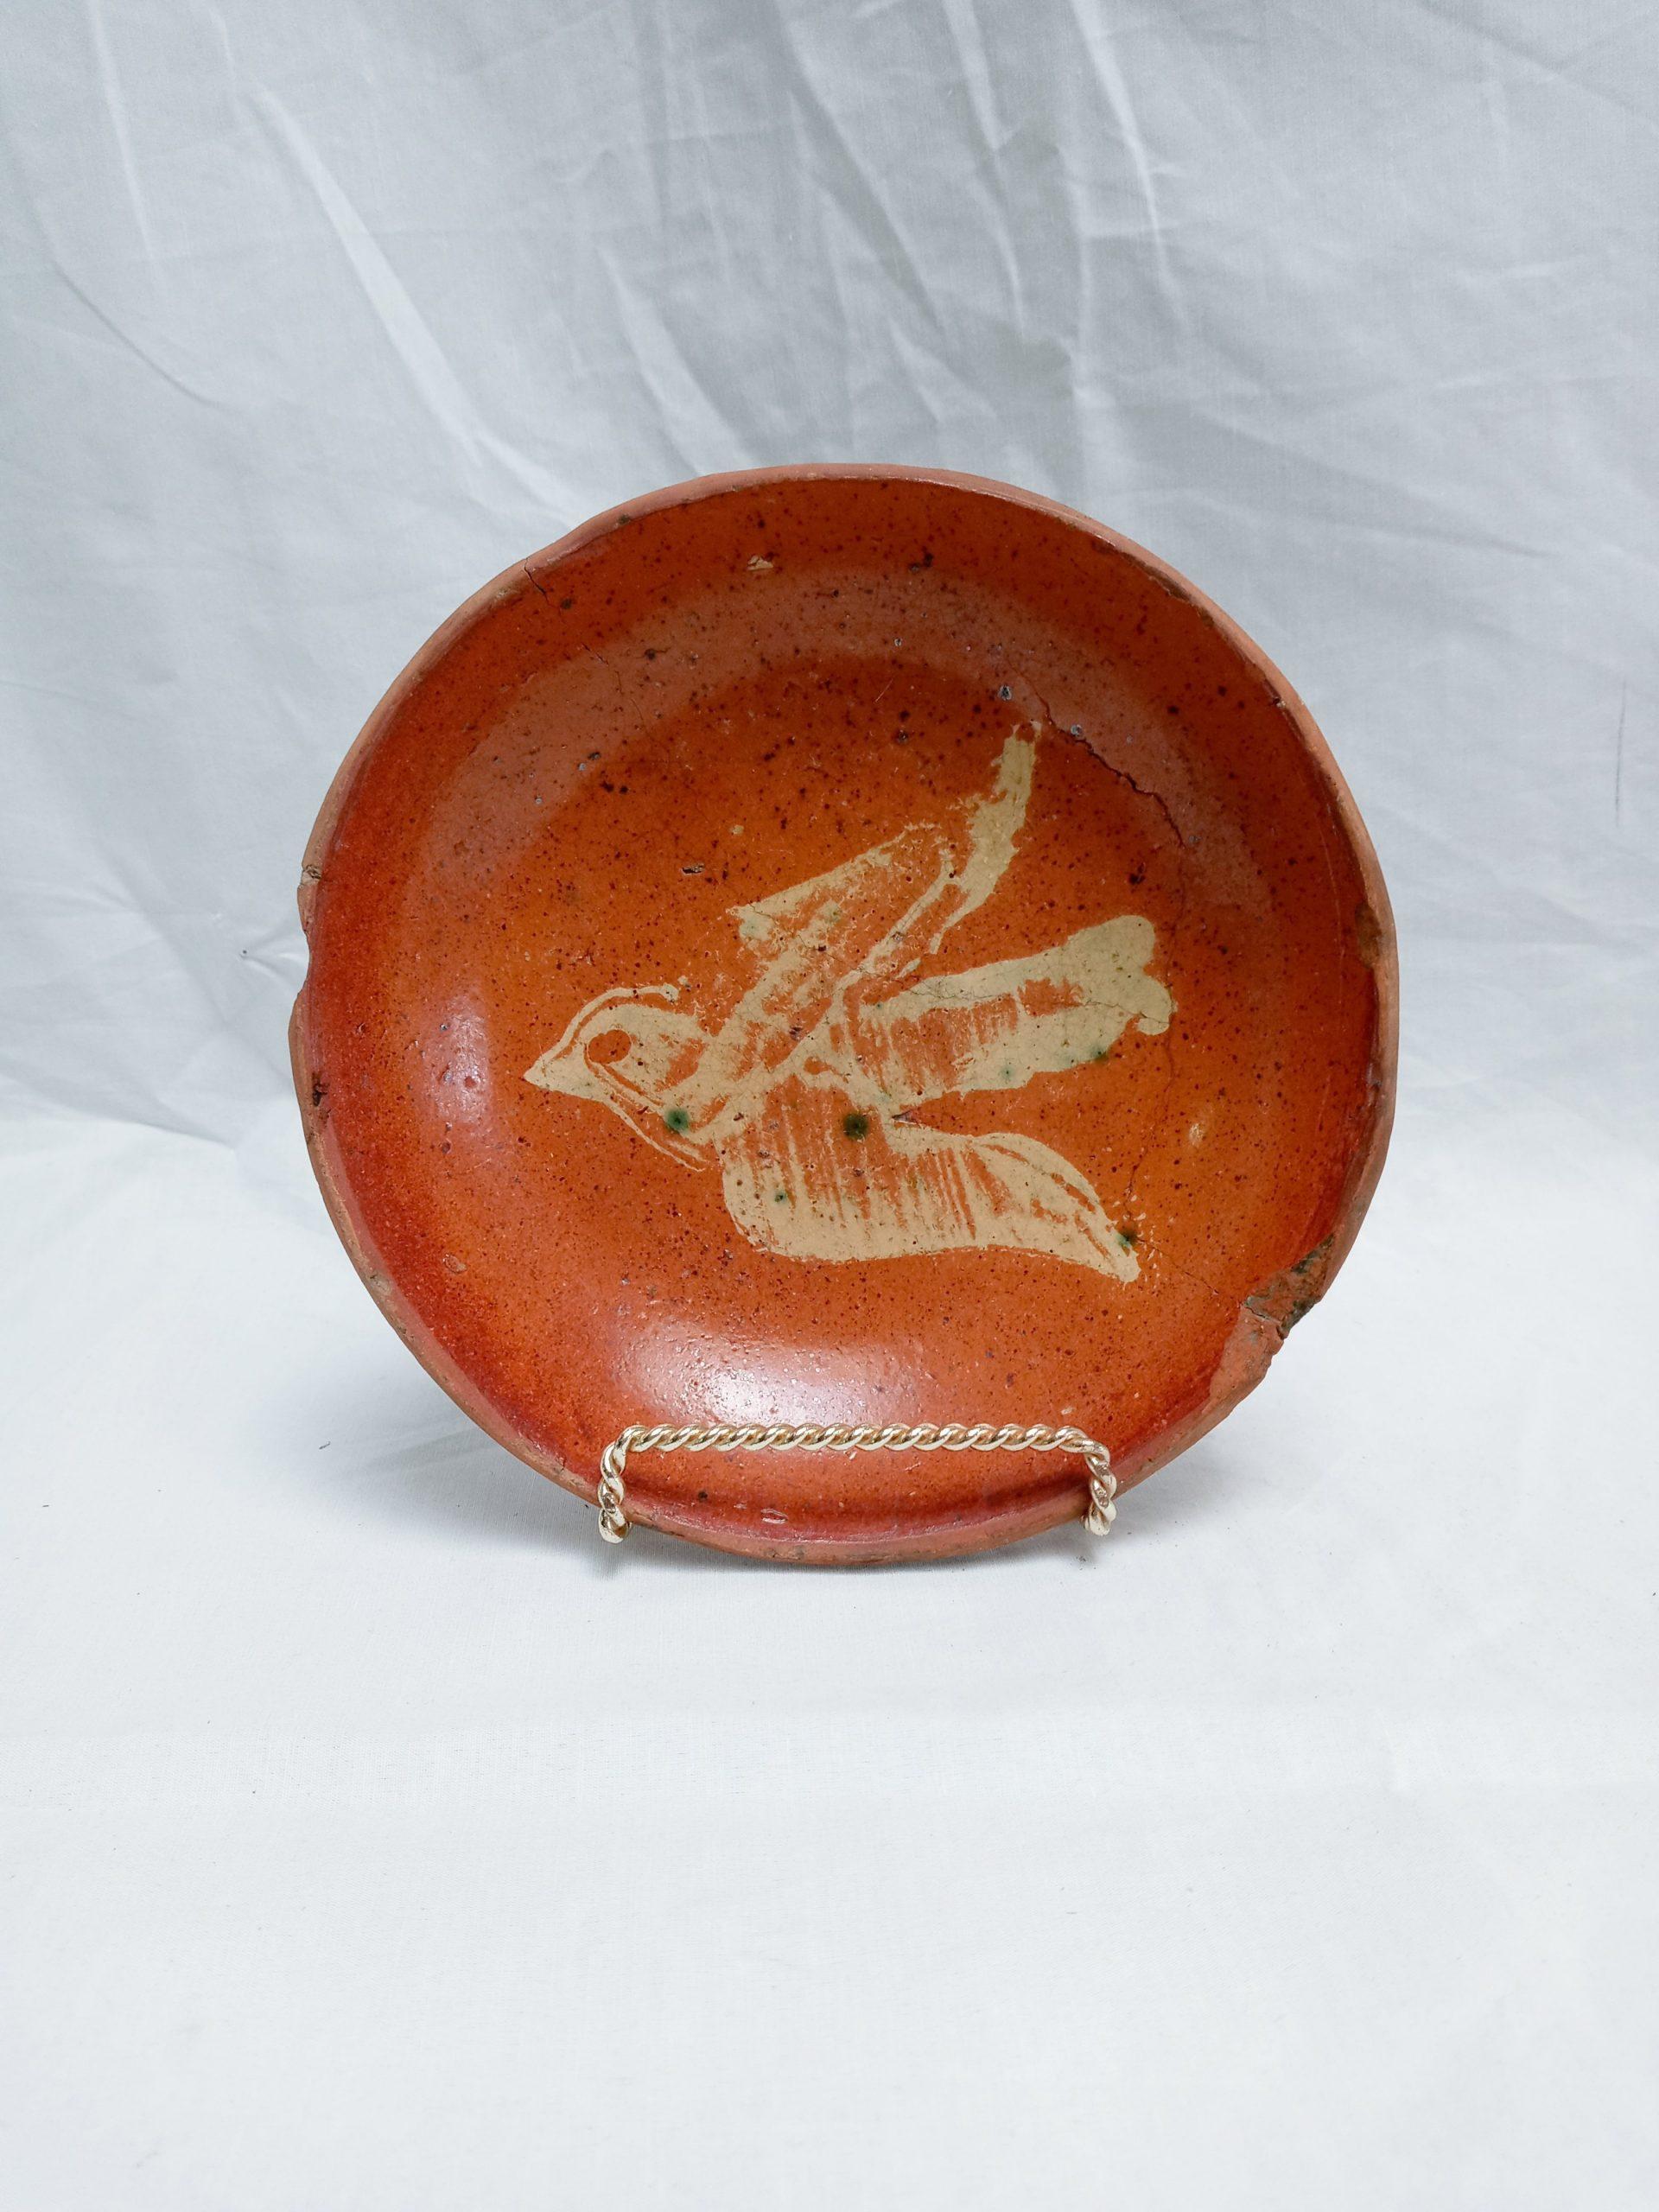 31-22286 Pennsylvania Redware Pottery Plate, rare yellow slip, bird in flight decoration, rim chips. Image